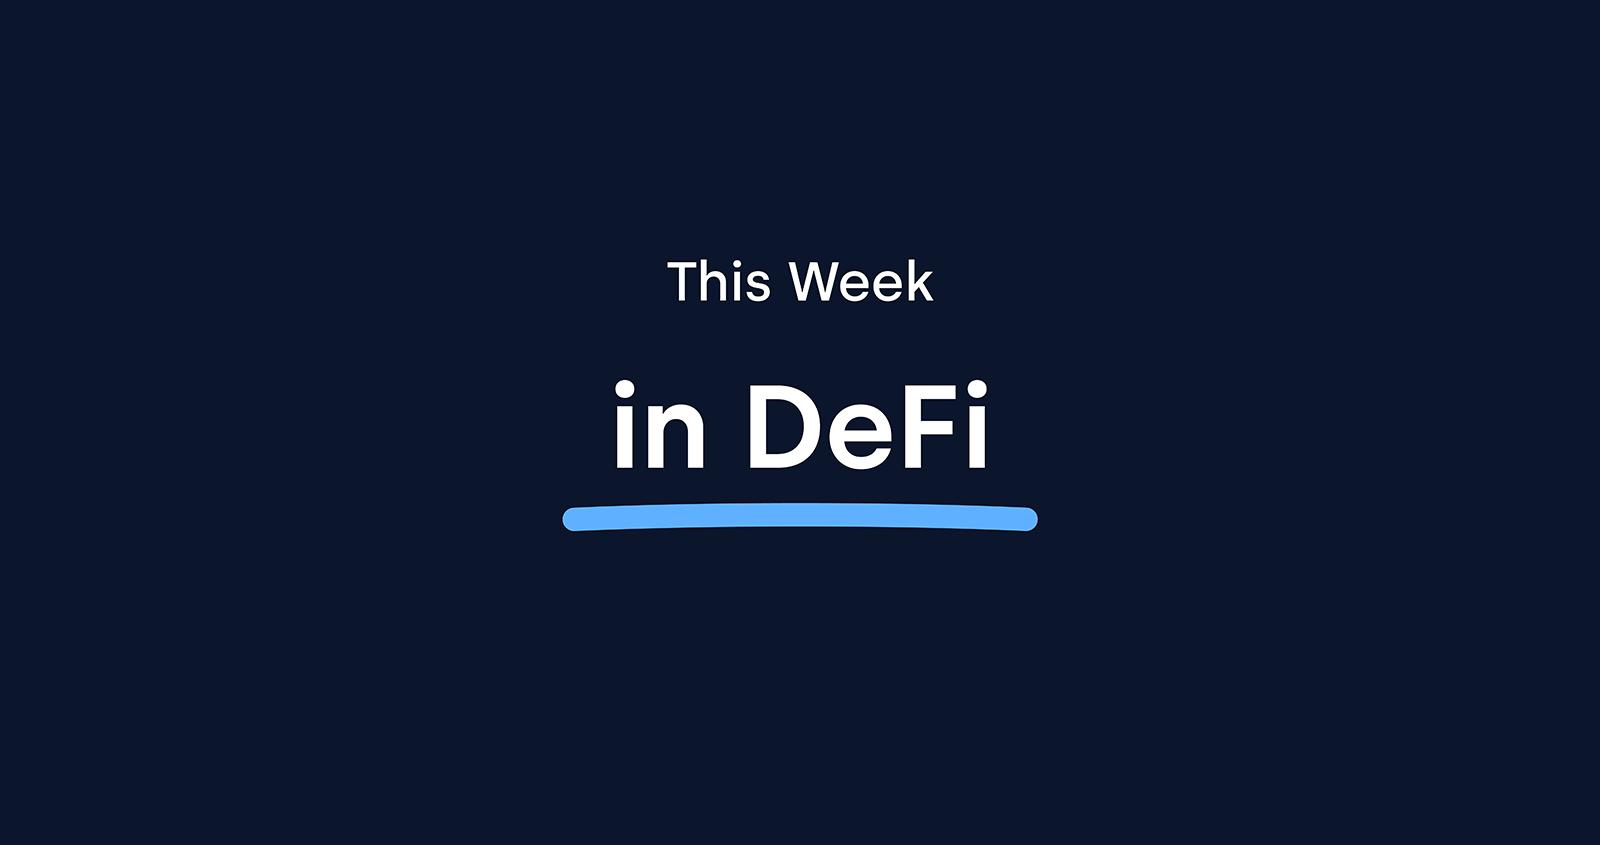 OKCoin DeFi update, Ethereum 2.0 update Ethereum serenity, DeFi asset correction, BTC rallies